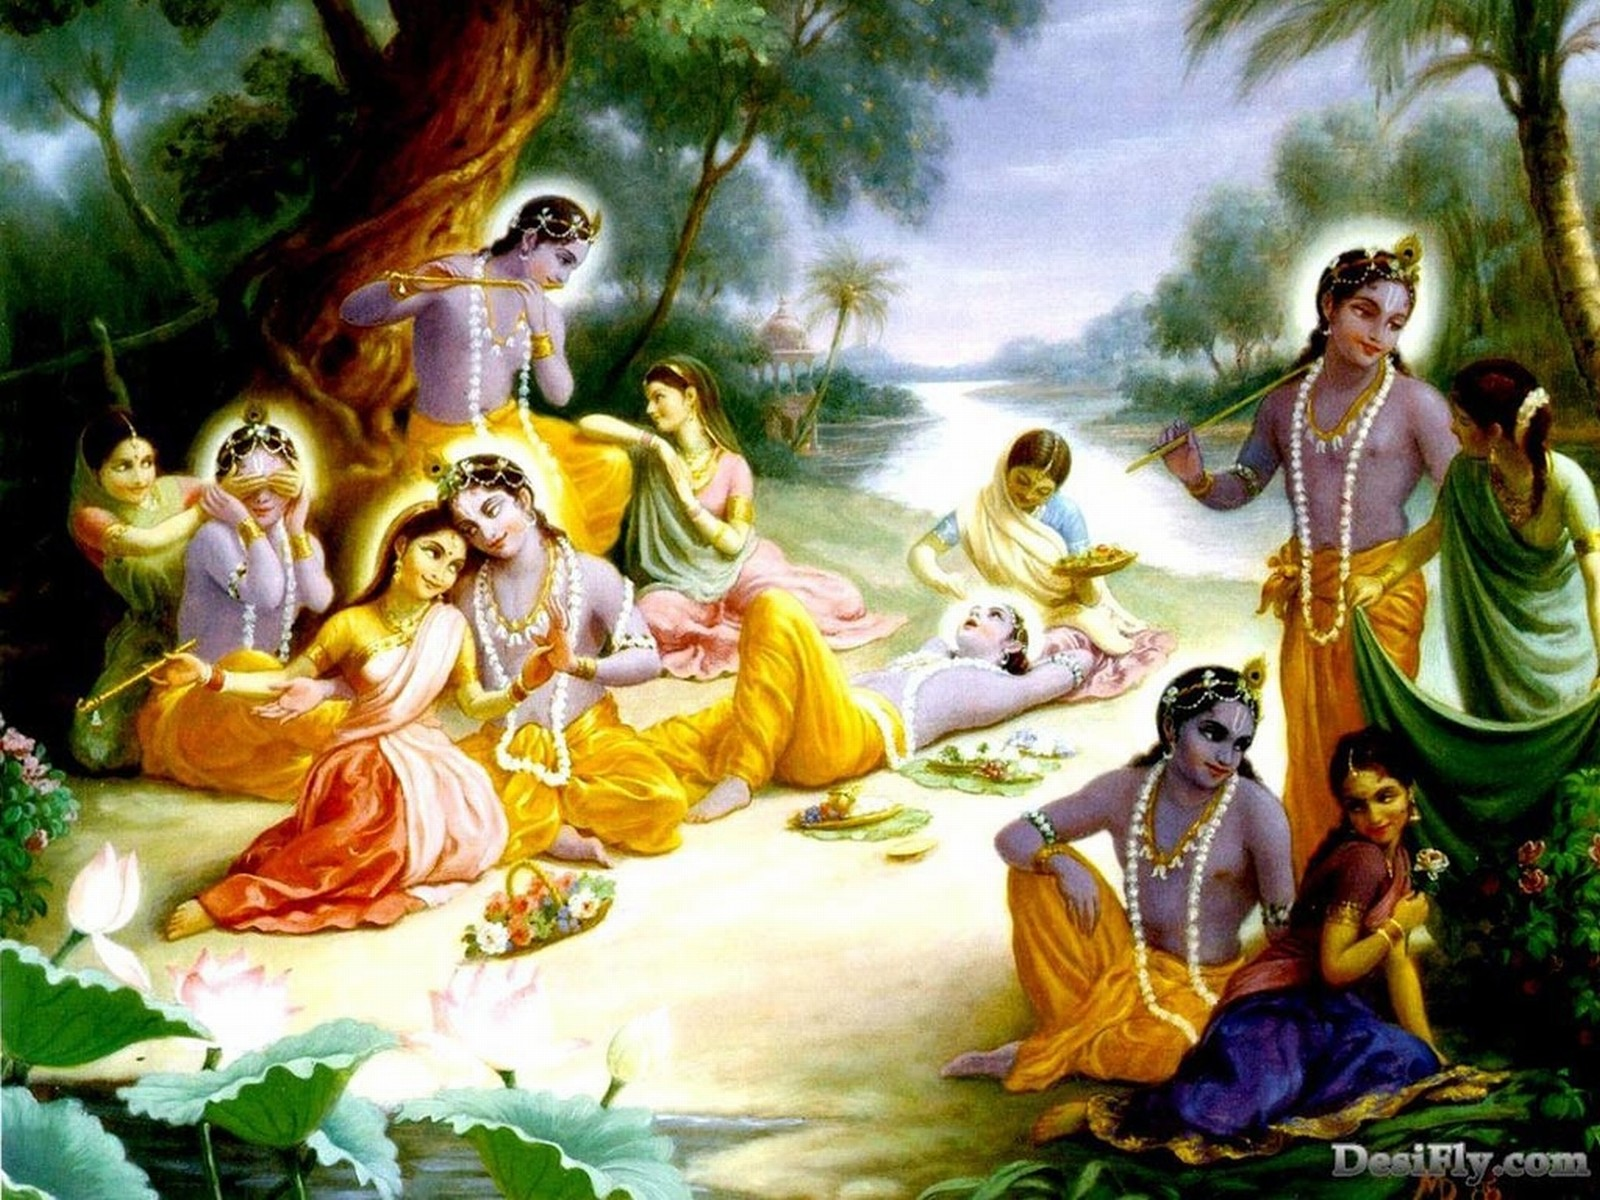 Wallpaper Gallery: Lord Krishna Wallpaper